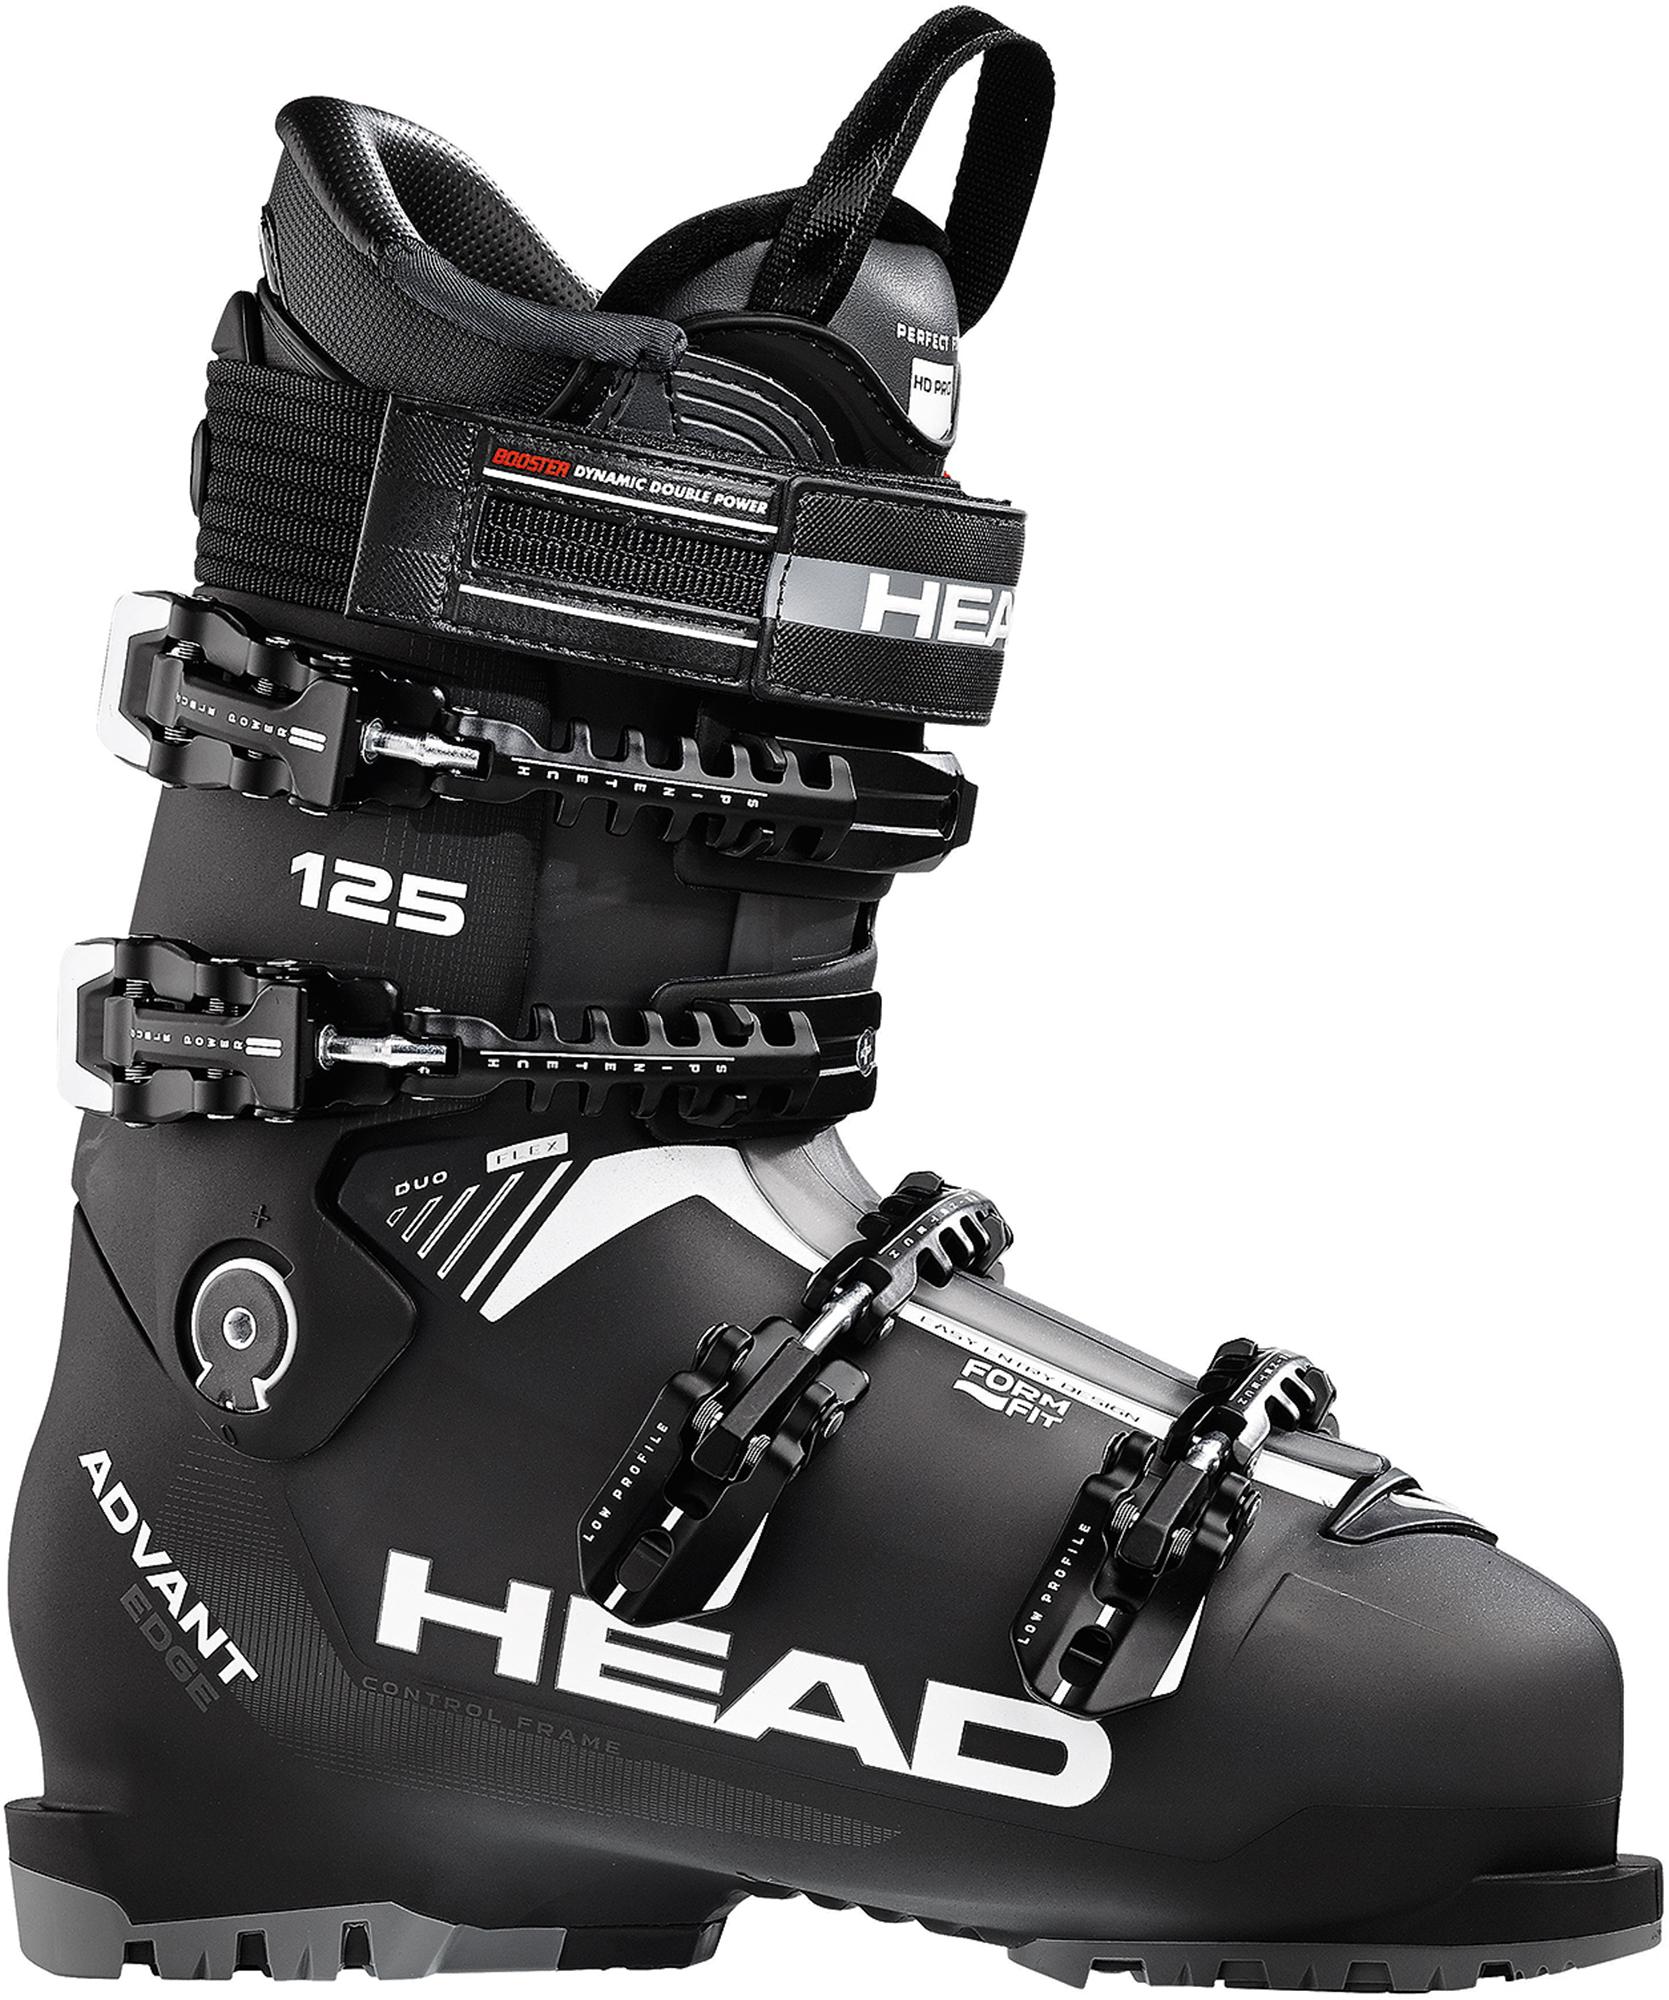 Head Ботинки горнолыжные Advant Edge 125S, размер 42,5